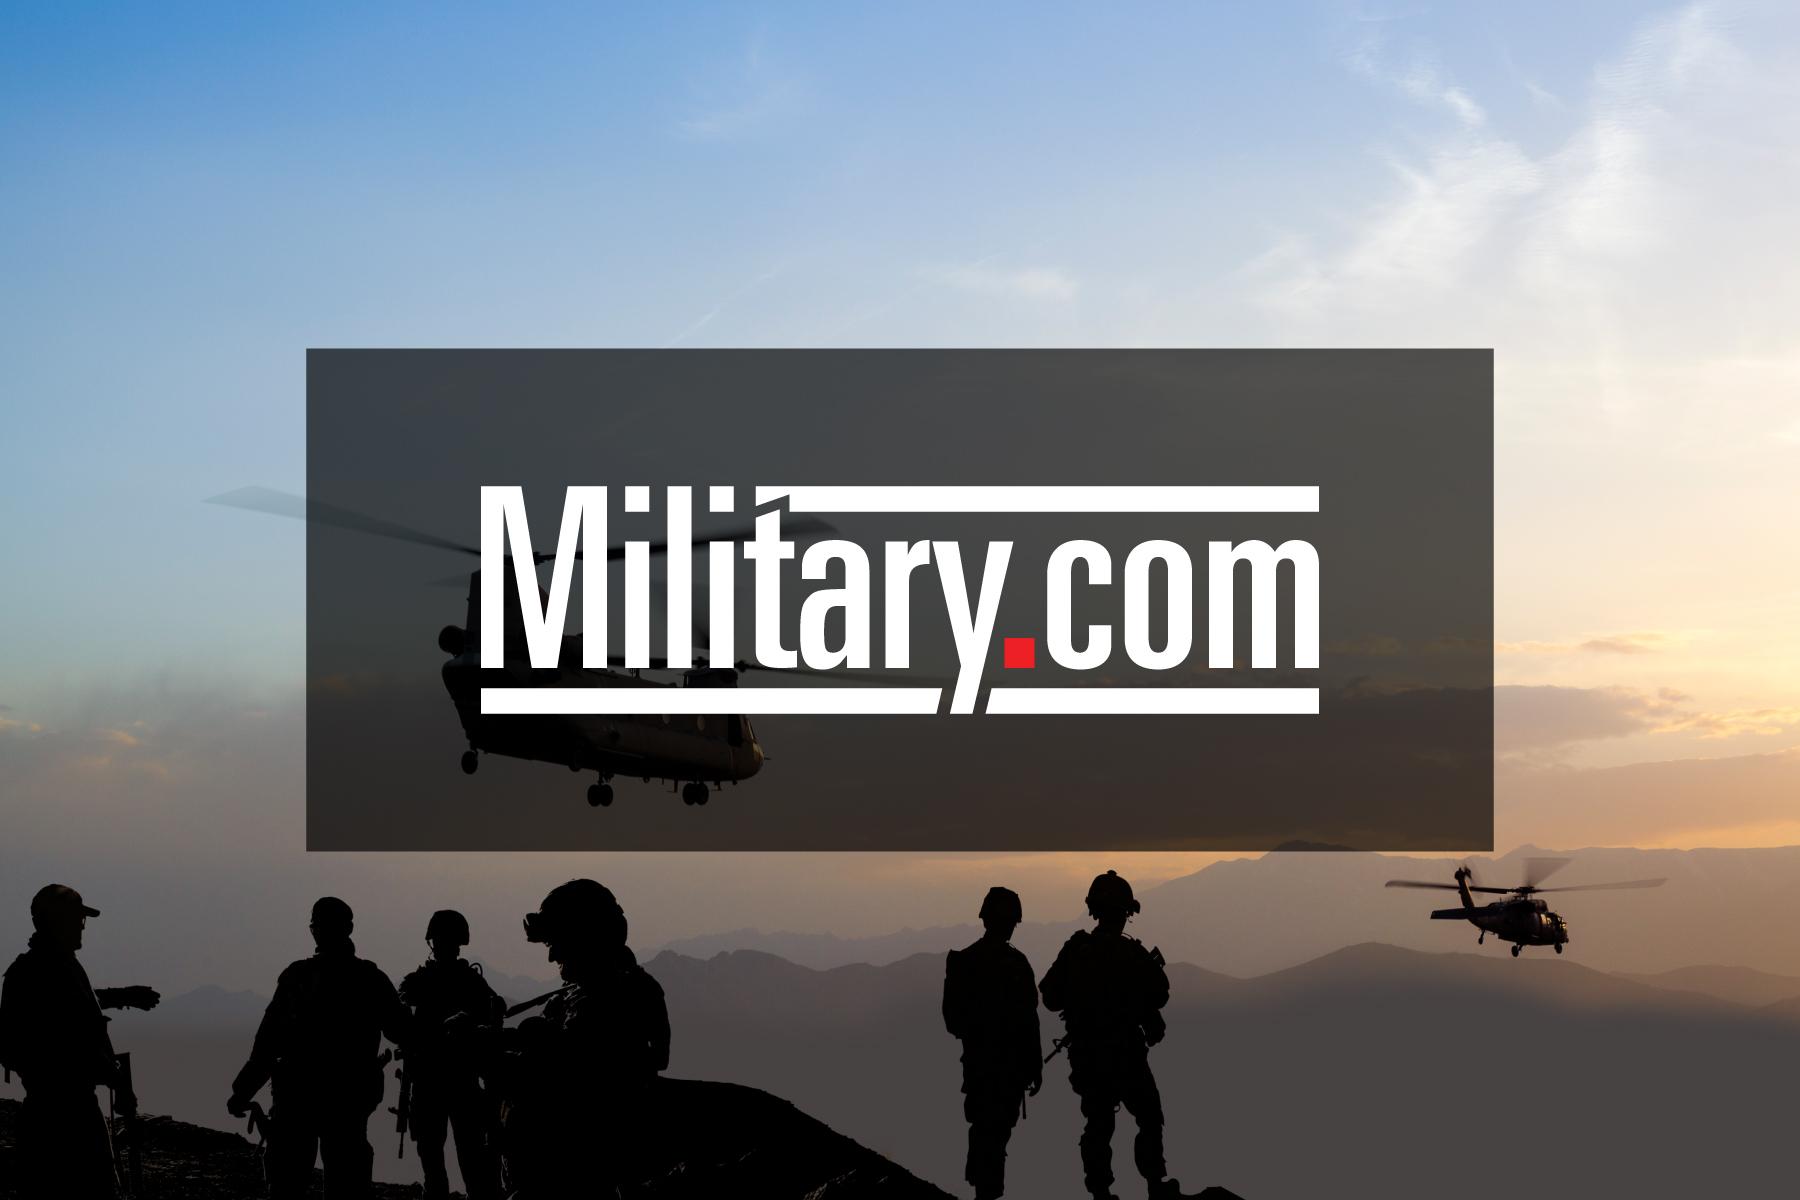 'Extraordinary Sacrifice:' Trump Awards Medal of Honor to Fallen Airman